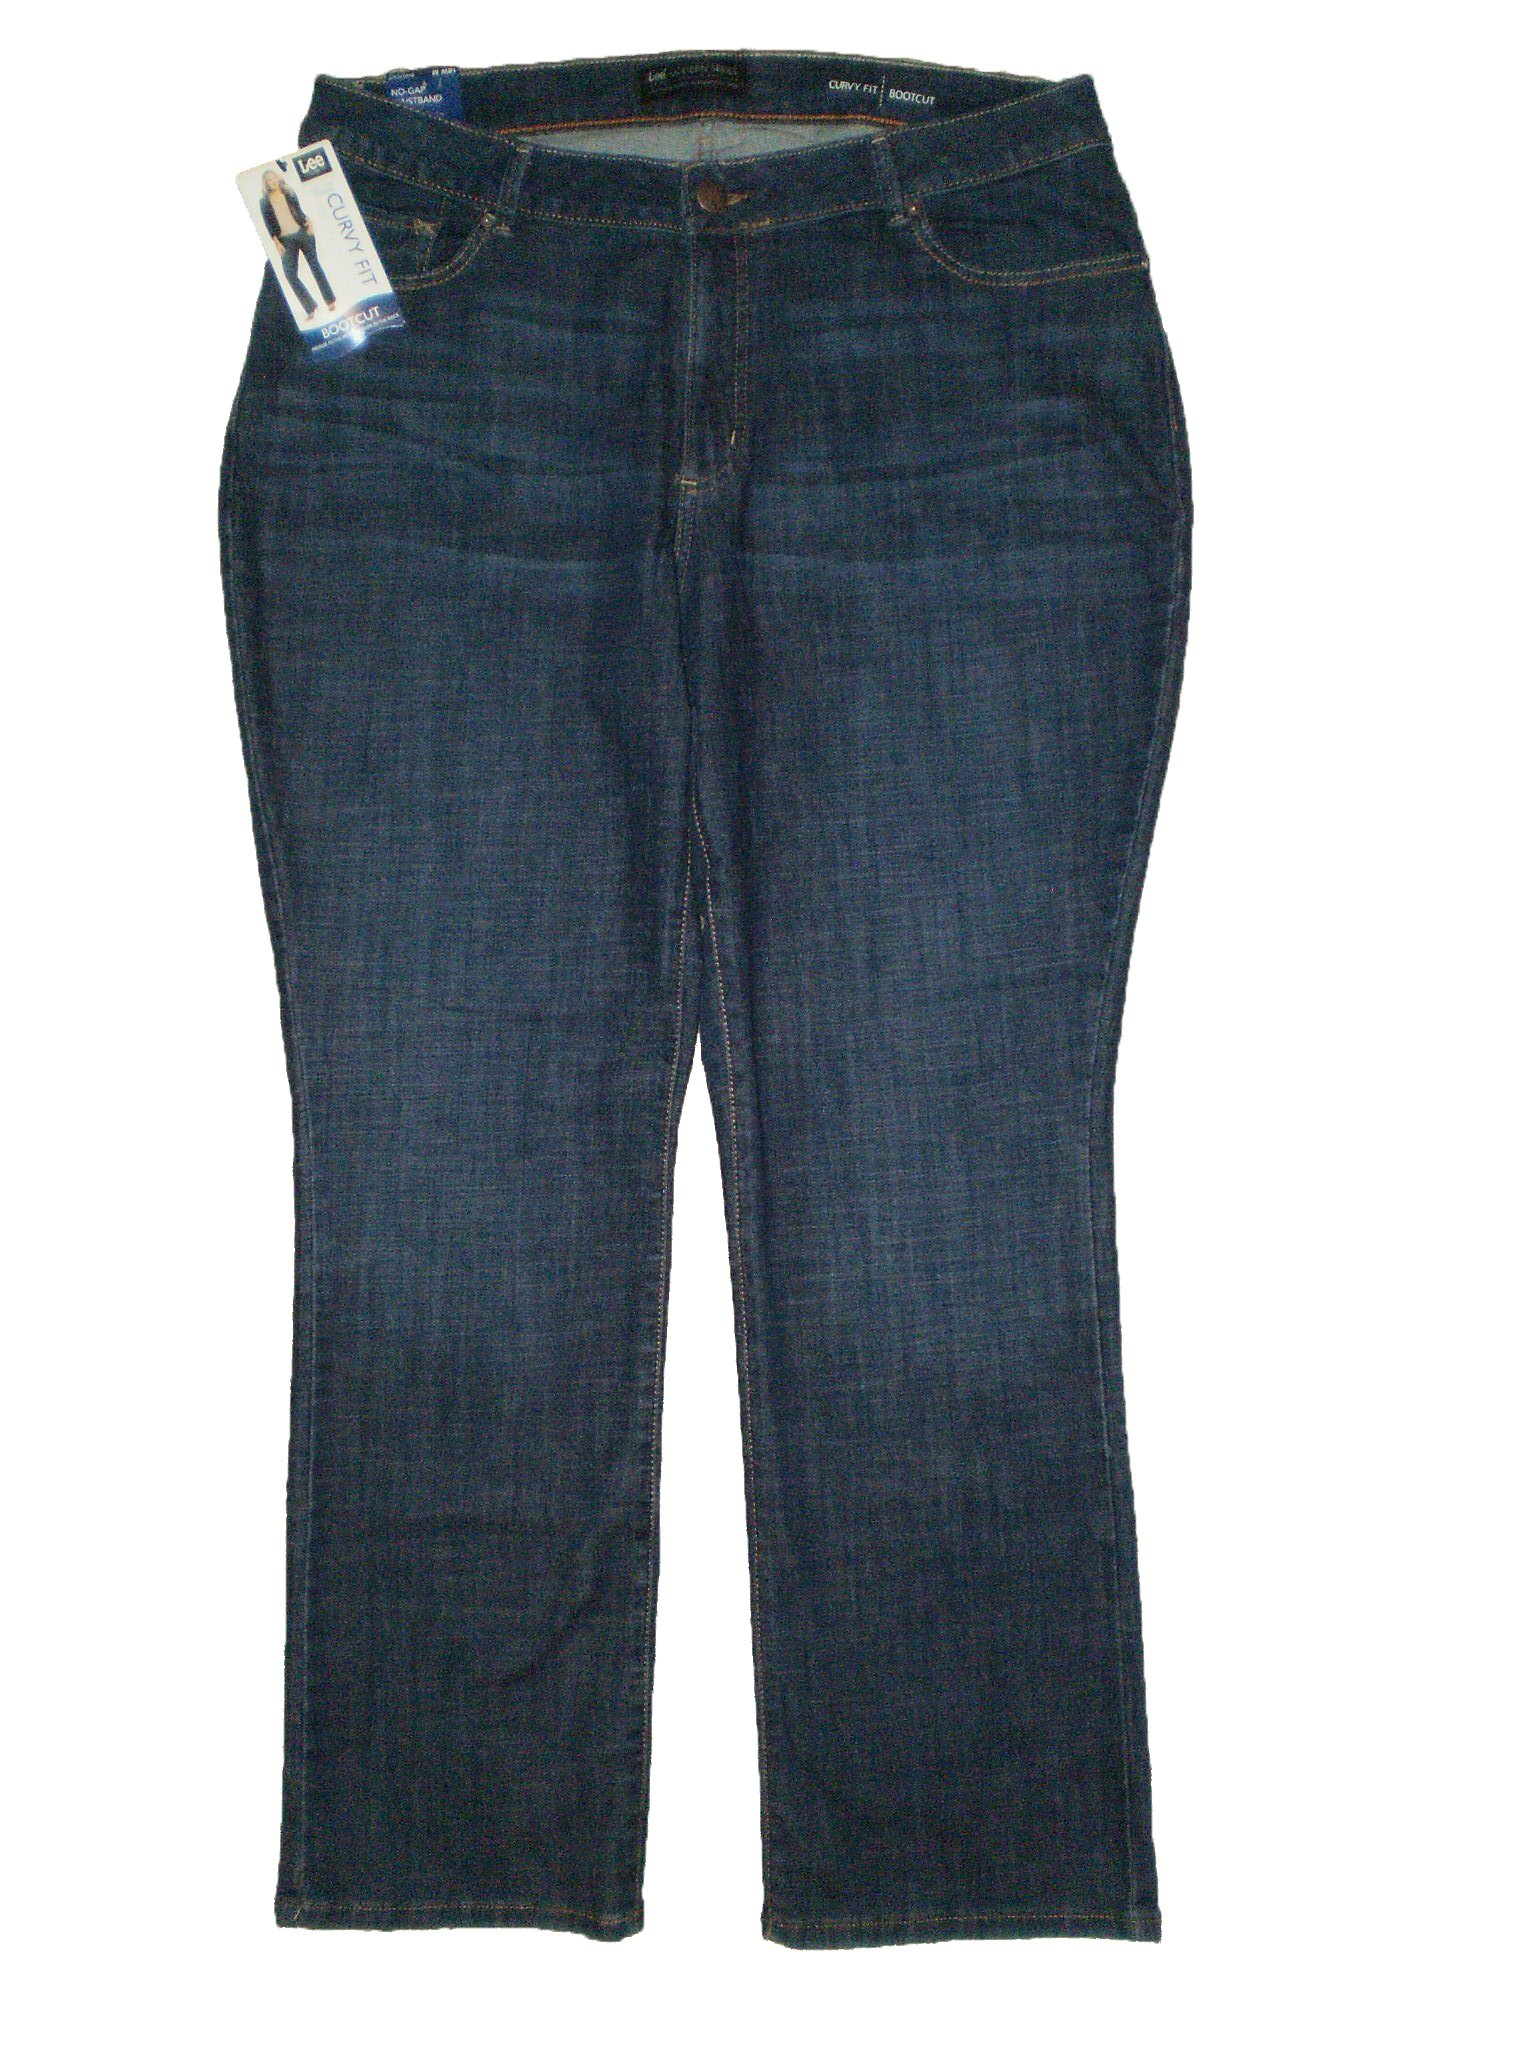 Lee Modern Series Mid Curvy Fit Boot Stretch Womens Petite Denim Jeans Plus Size 24W Petite